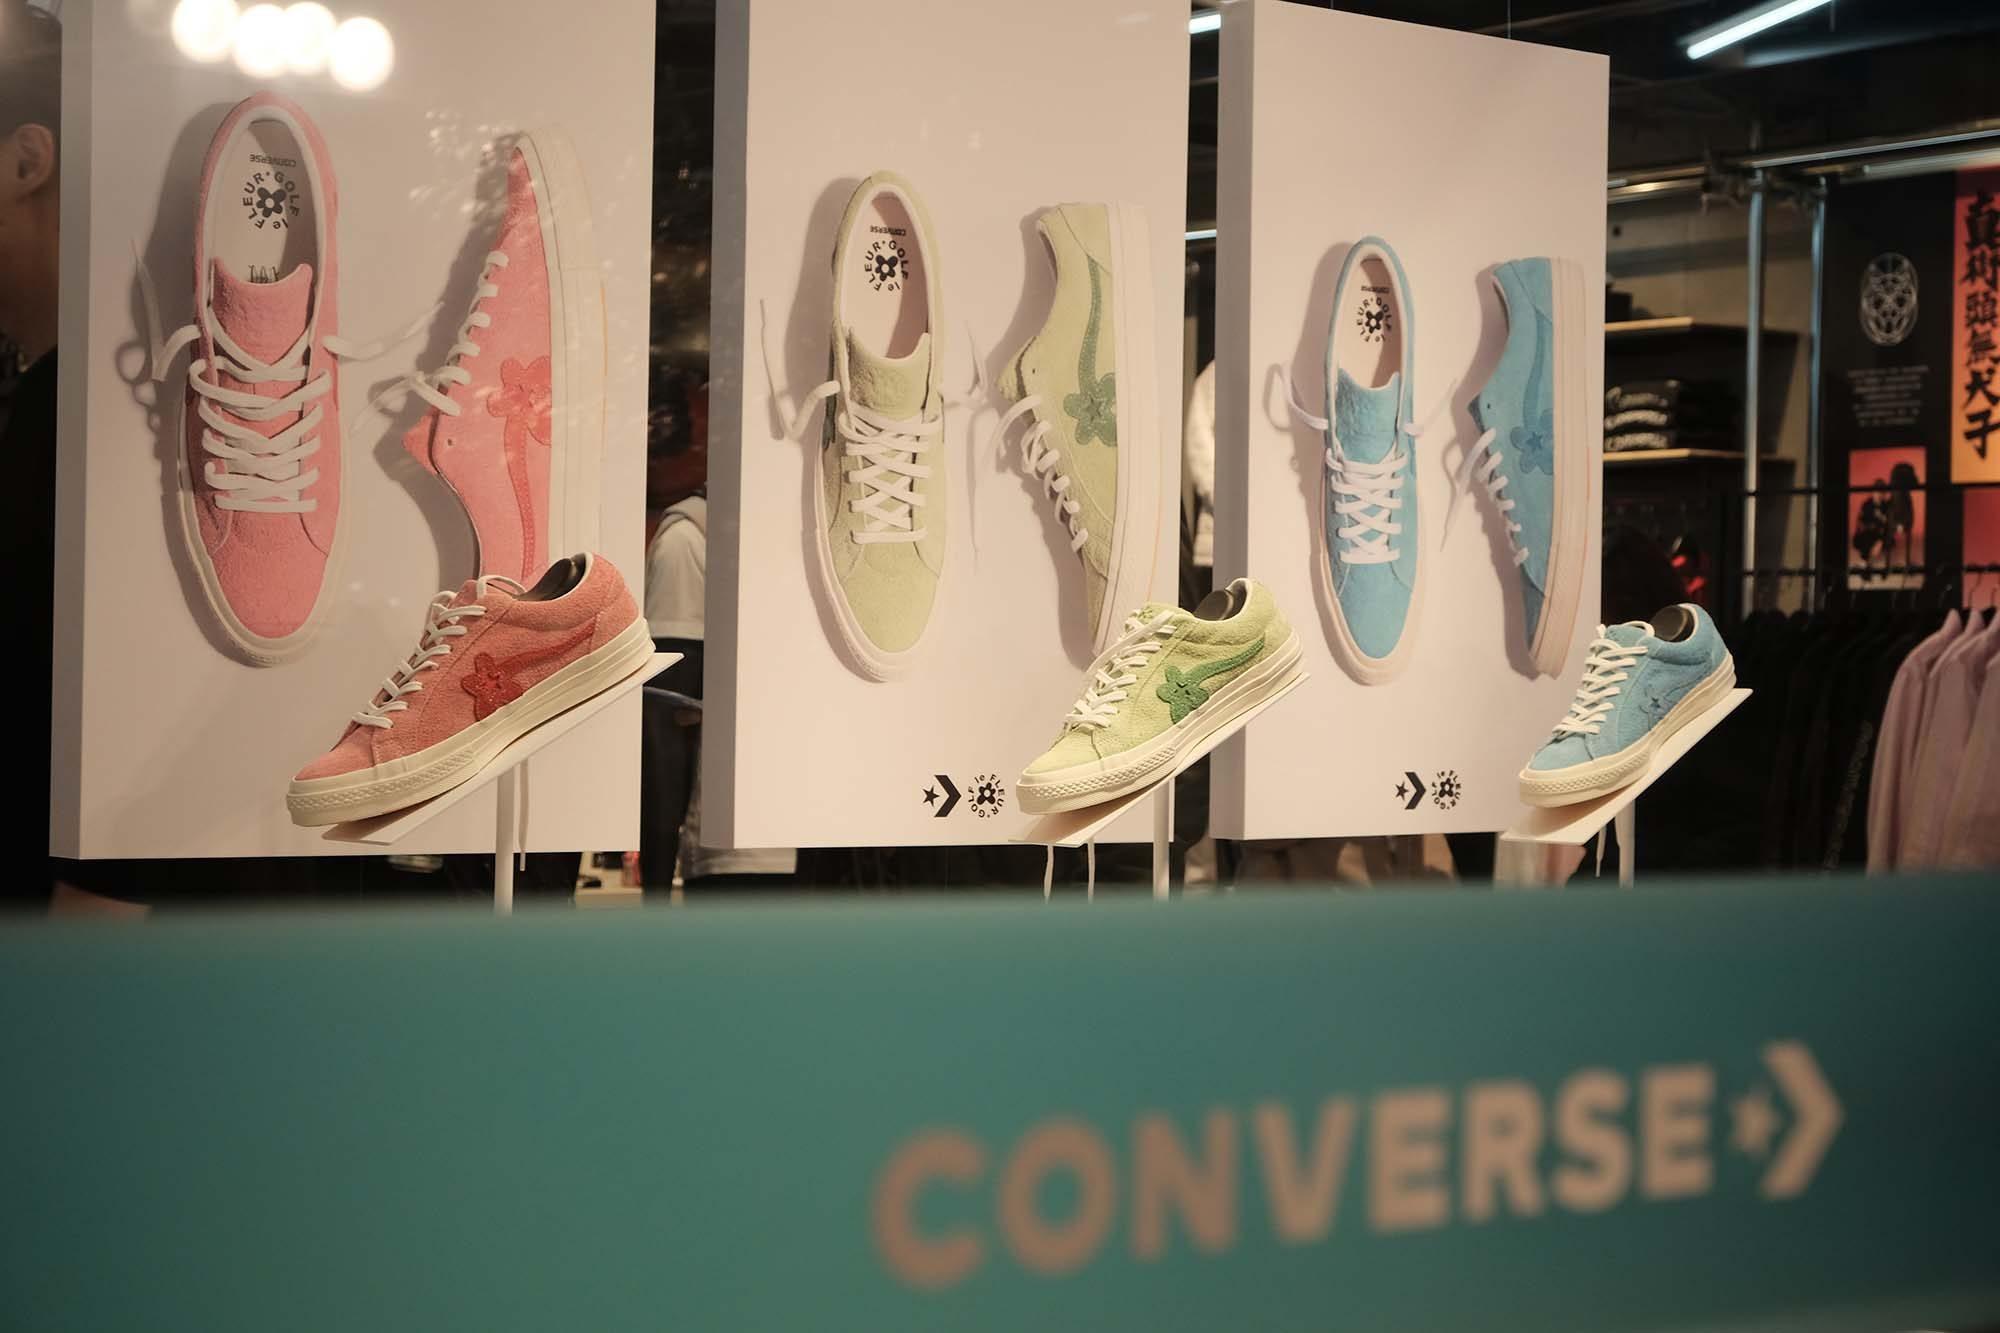 converse-taipei-dun-nan-3-reopen-20